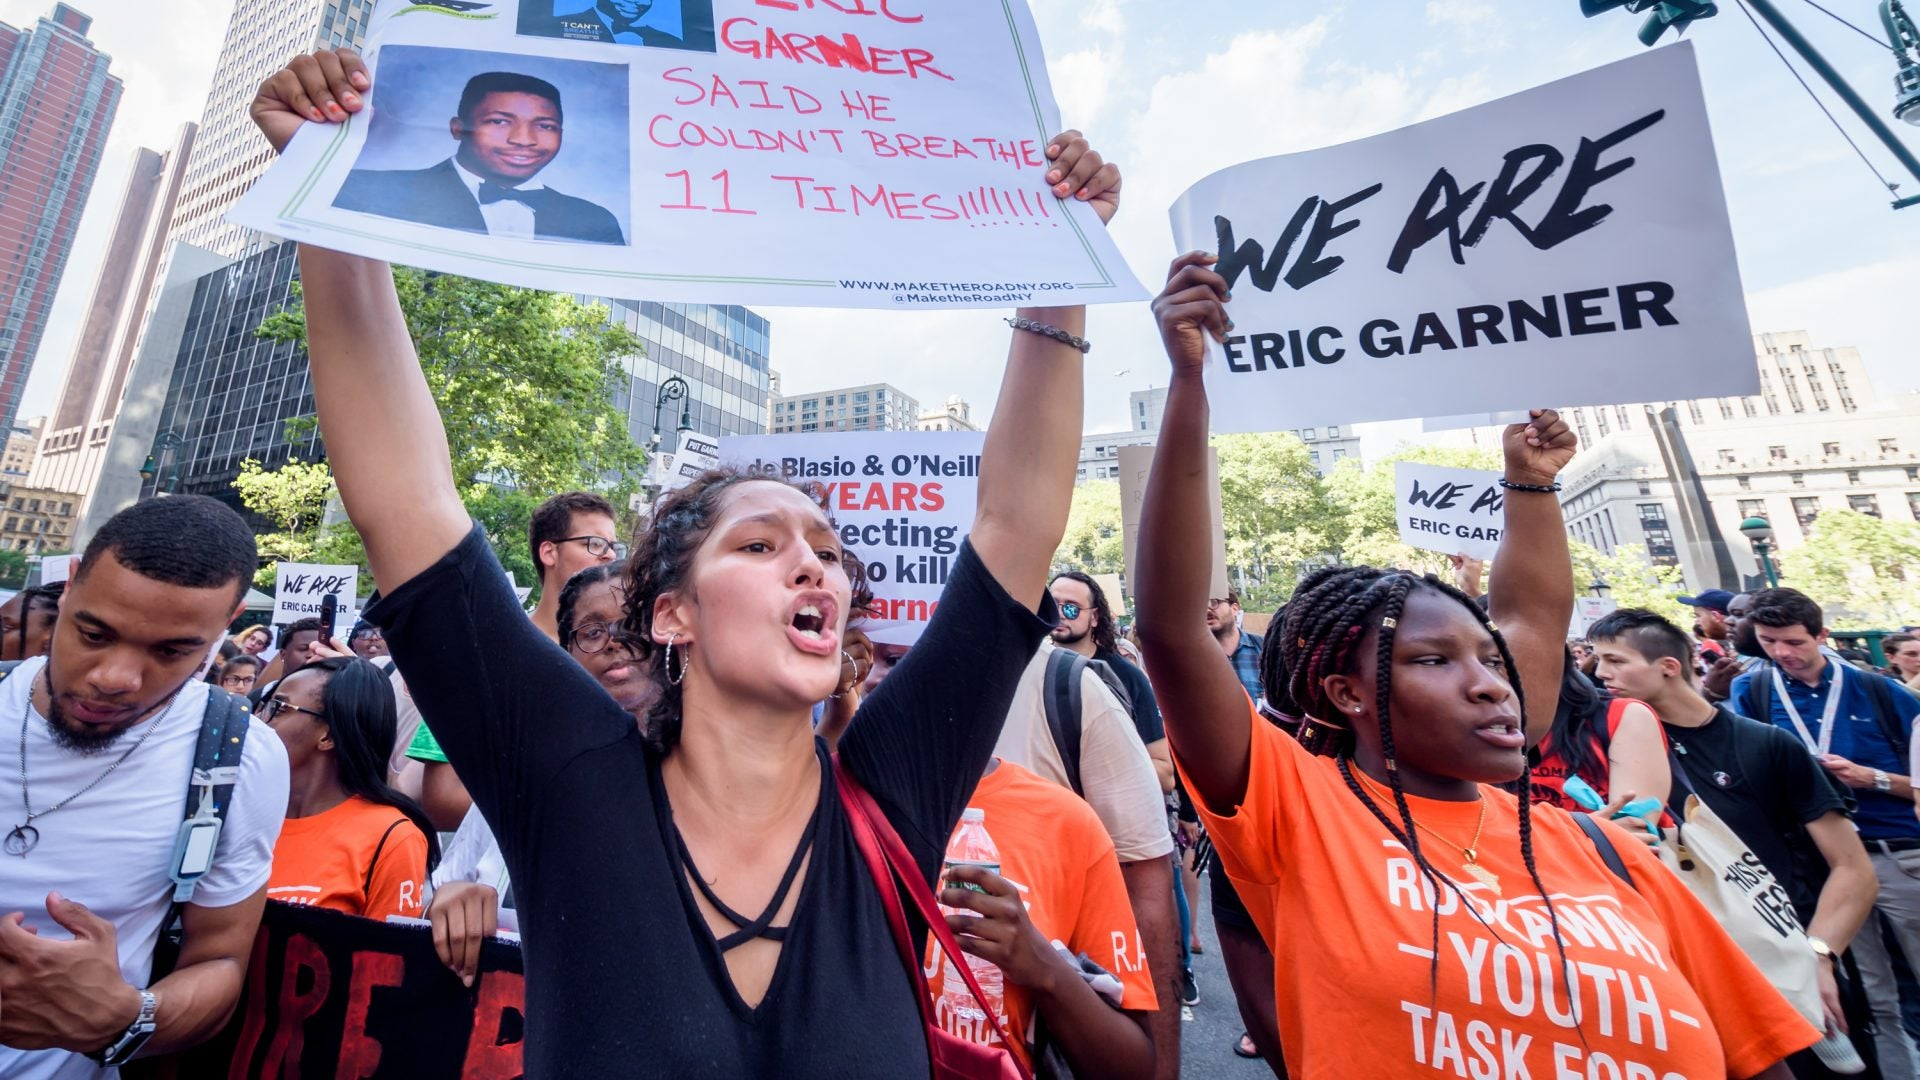 New York Legislature Passes Bill Criminalizing Use Of Chokehold